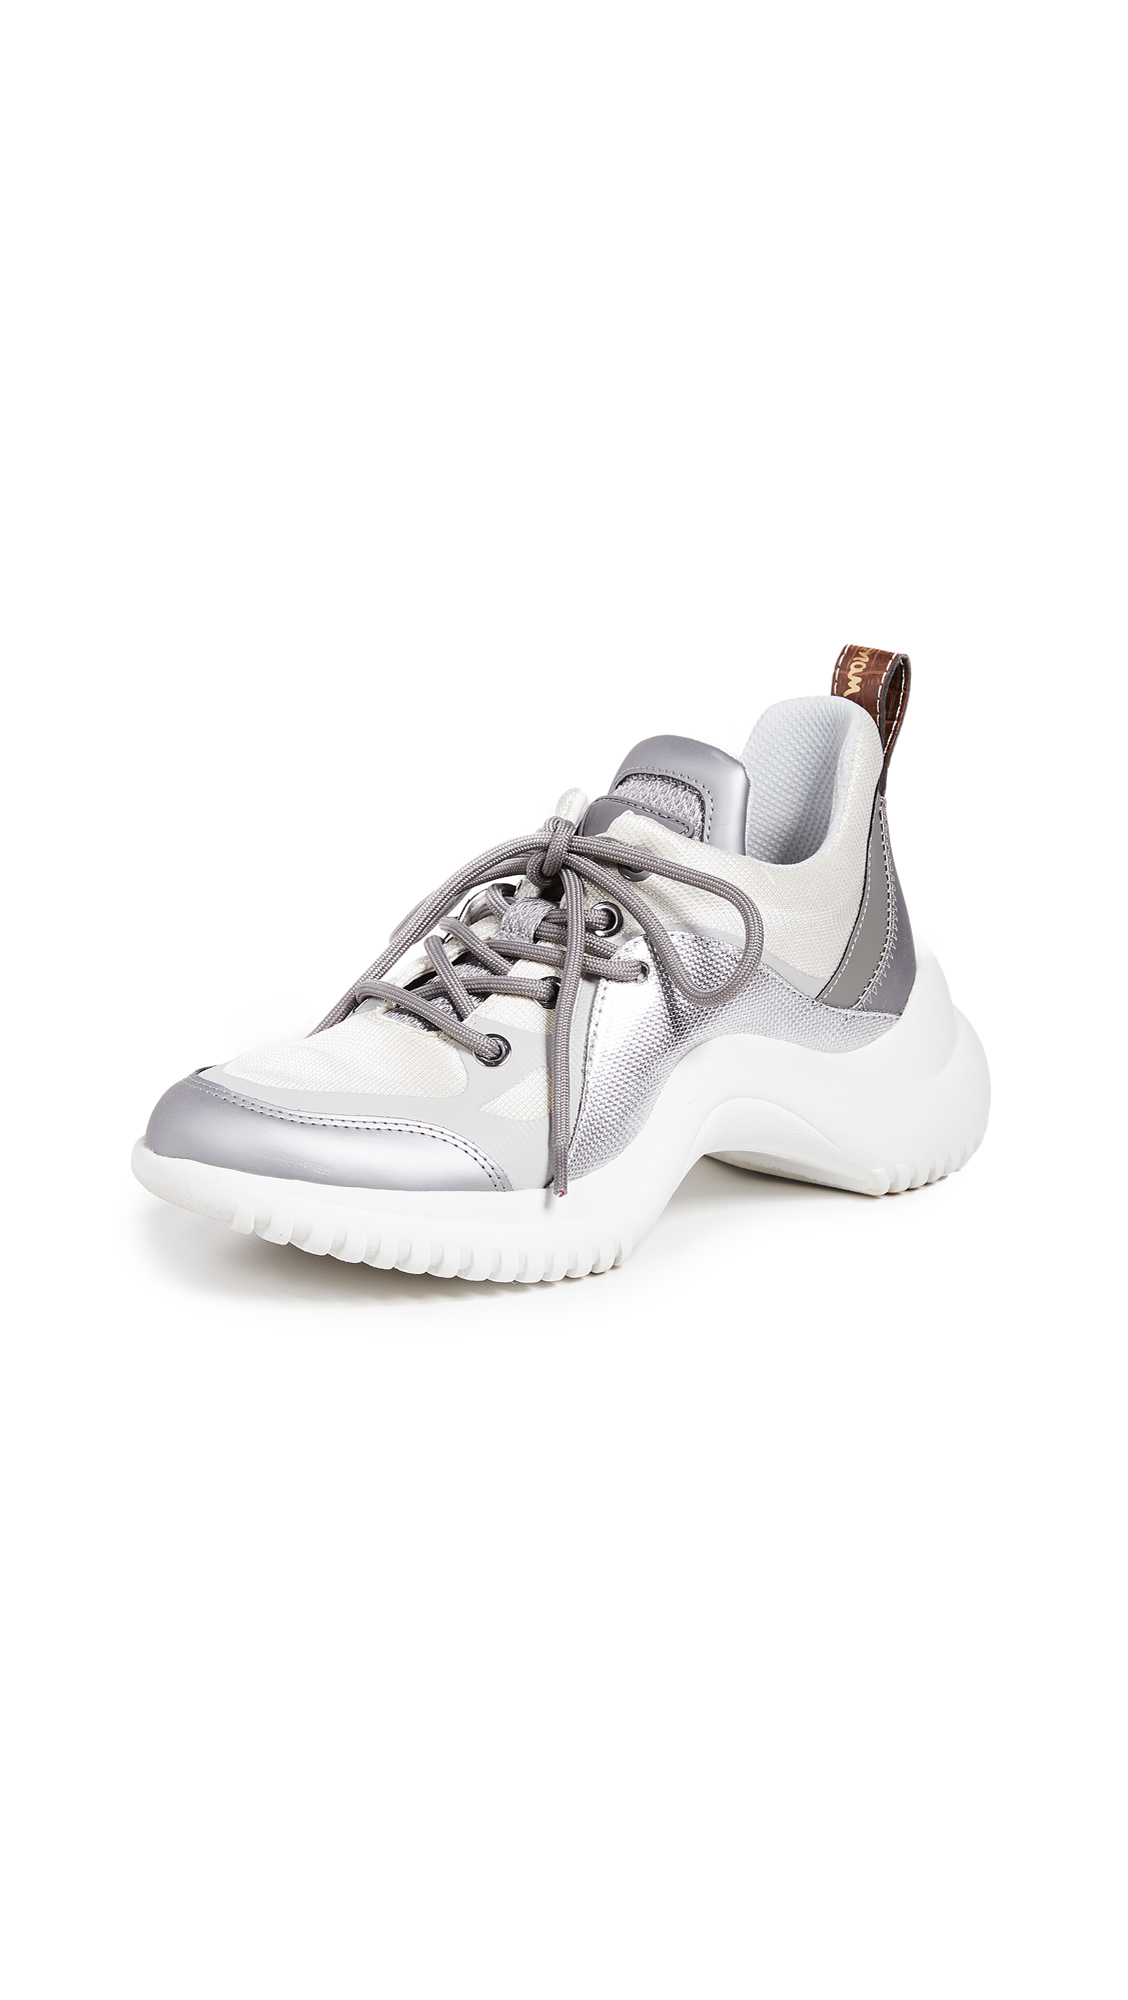 Sam Edelman Meena 2 Sneakers